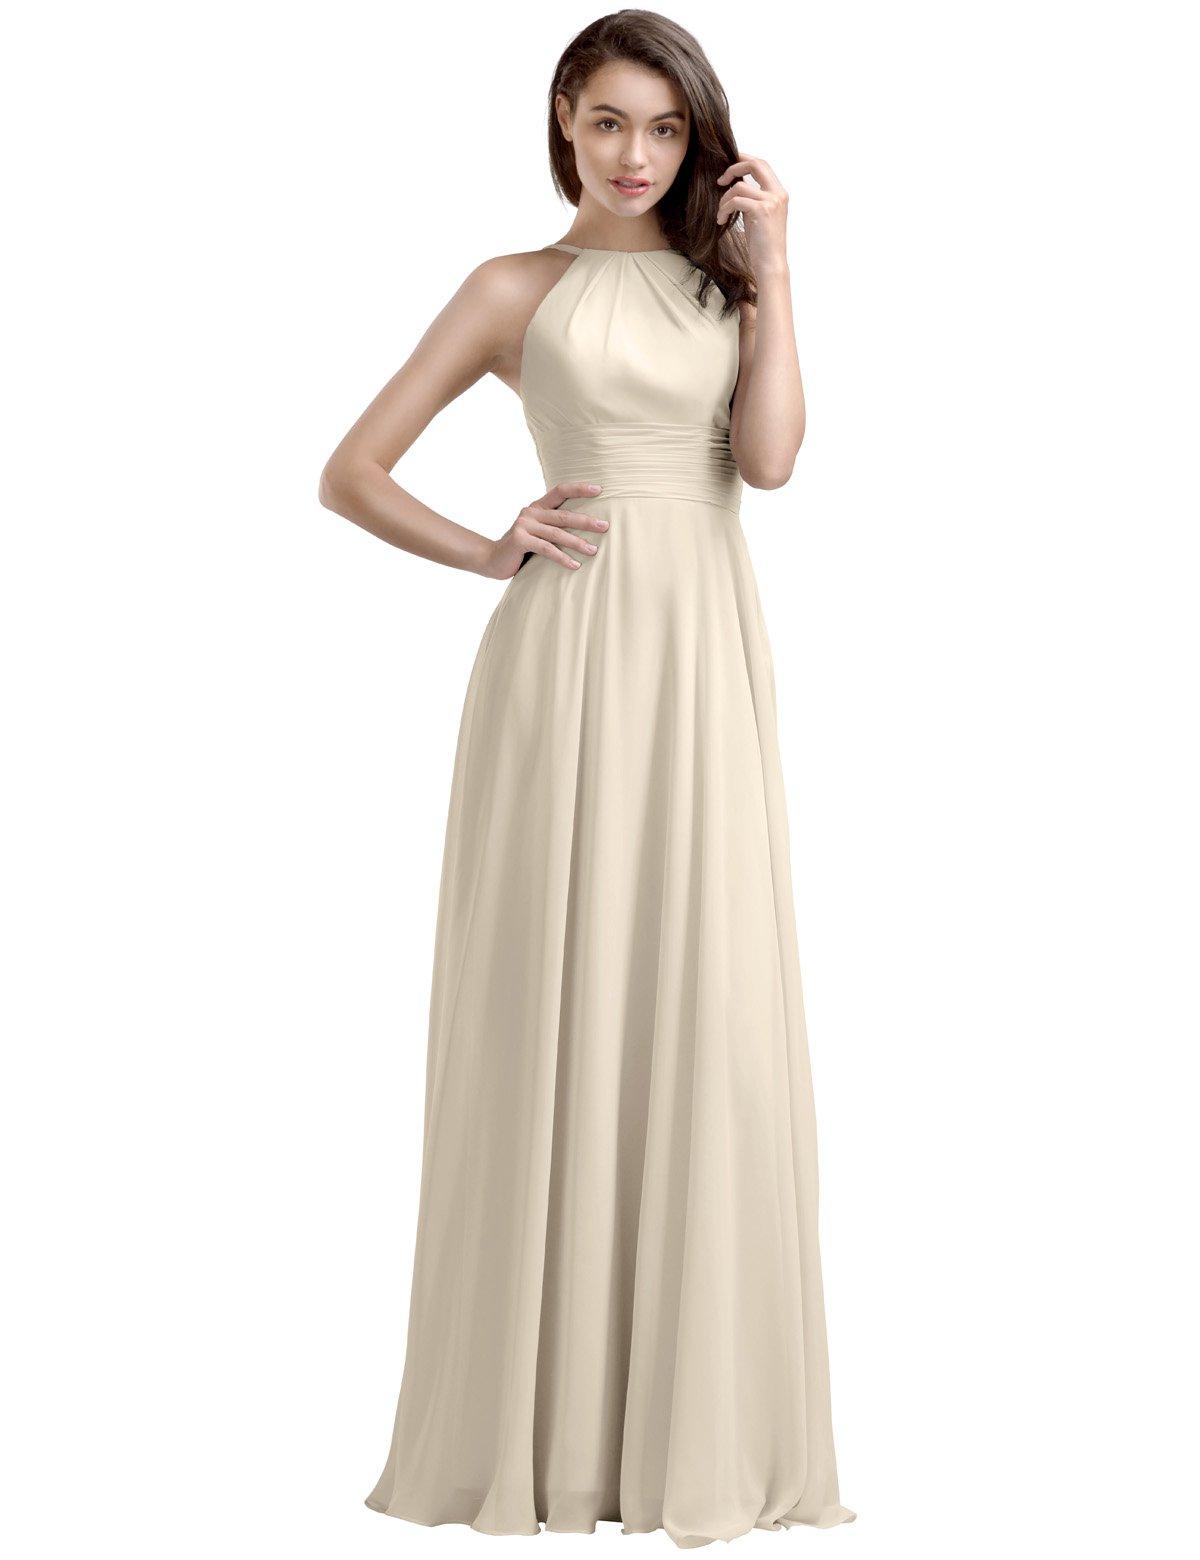 AWEI Bridal A-Line Long Bridesmaid Dress Chiffon Prom Dress with Round Neck, Champagne, US14